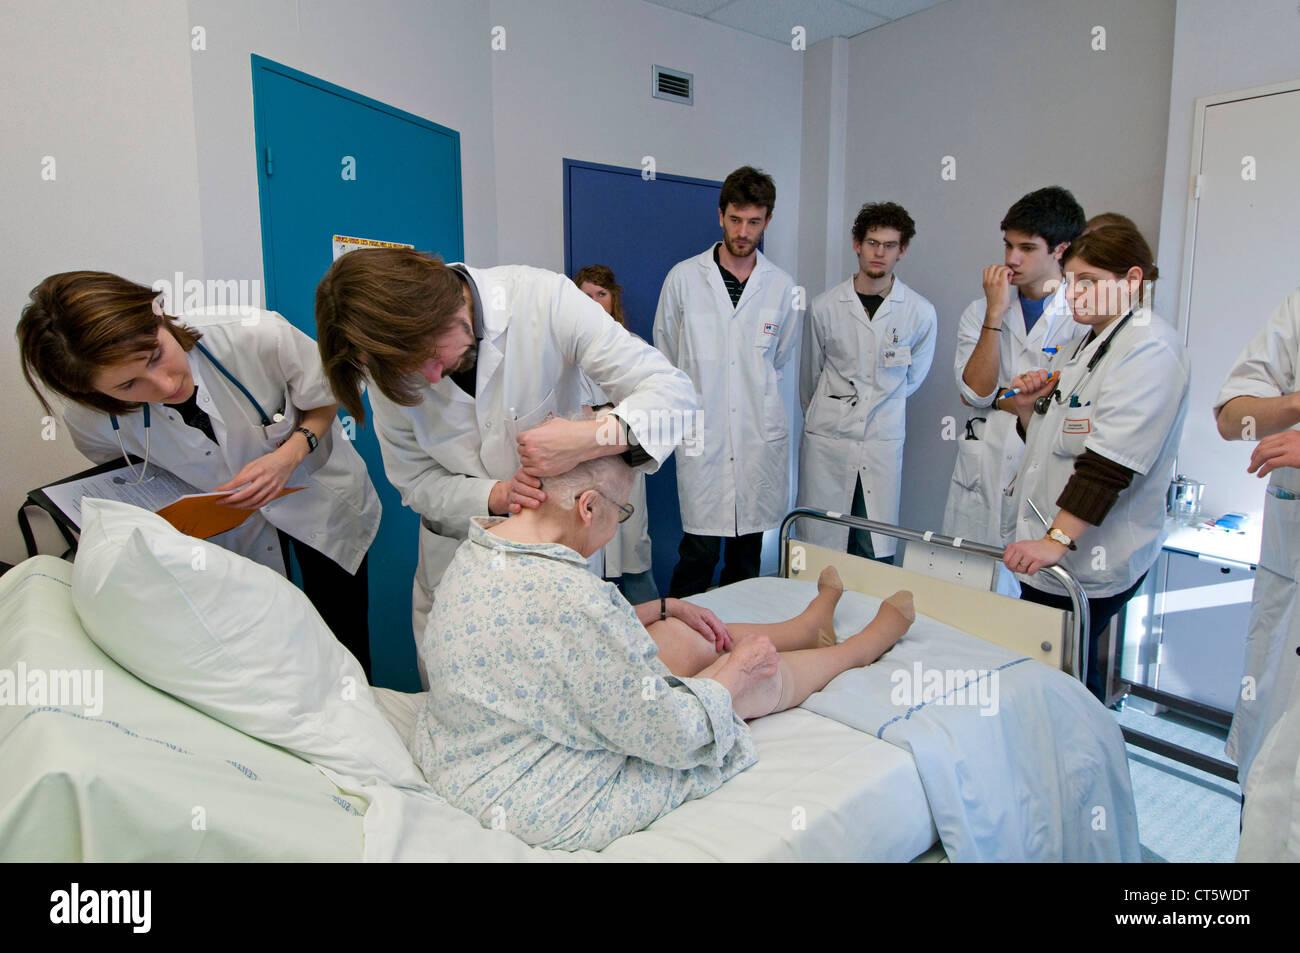 MEDICAL SCHOOL - Stock Image